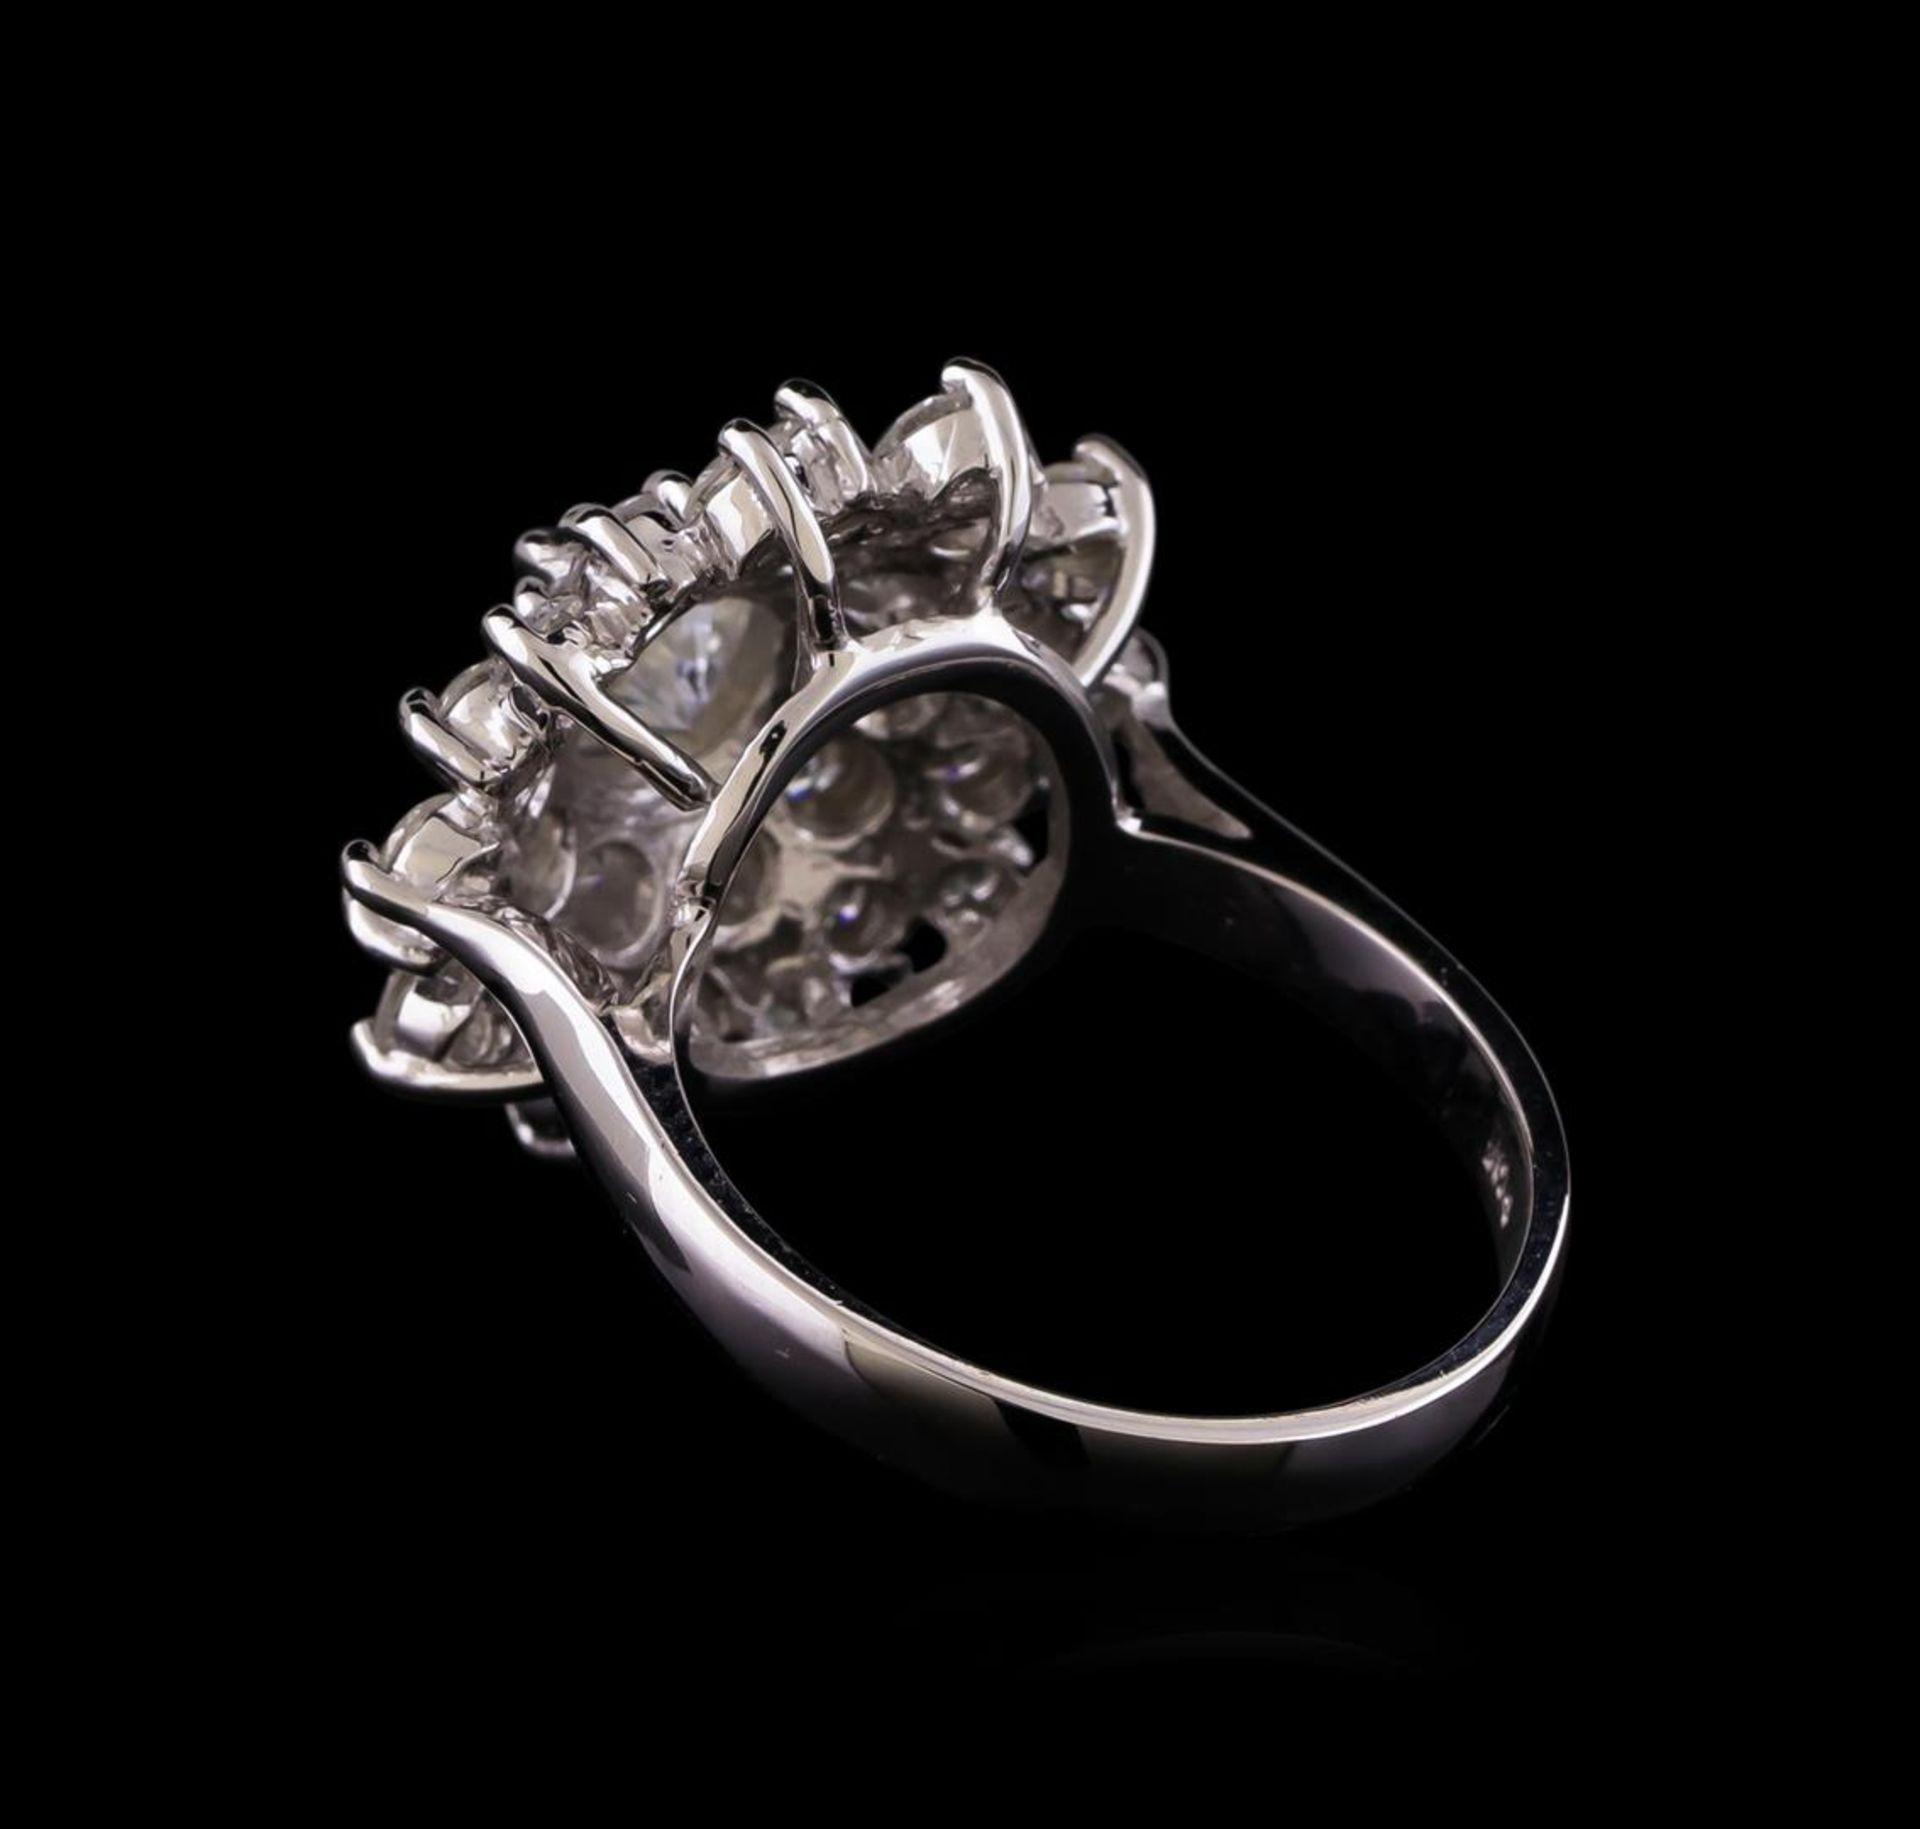 14KT White Gold 2.64 ctw Diamond Ring - Image 3 of 5